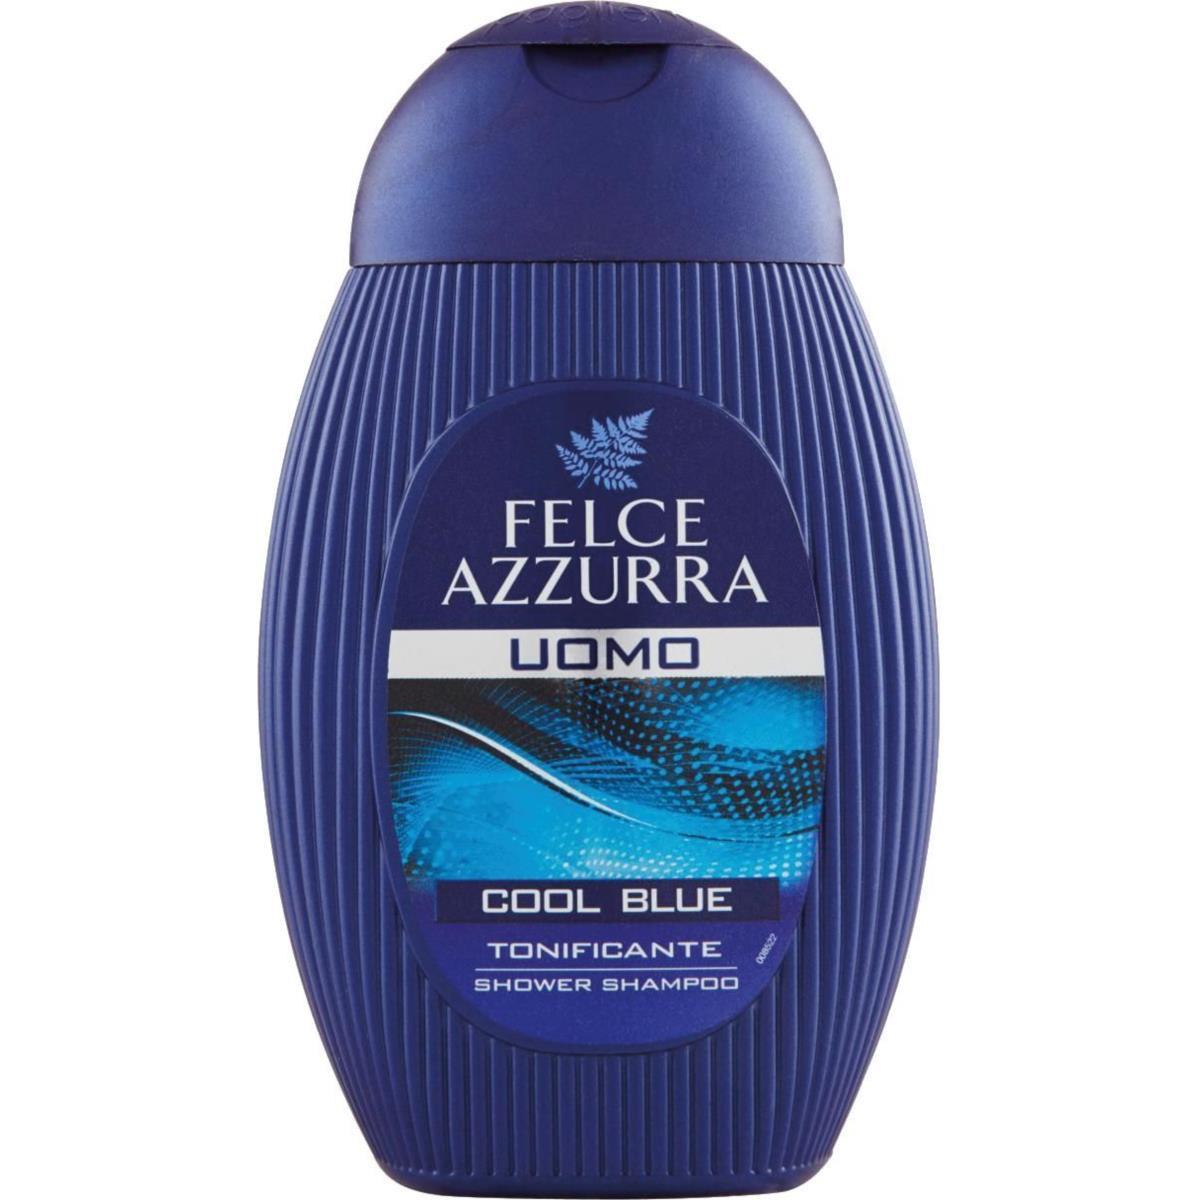 Docciashampoo Uomo Felce Azzurra COOL BLUE Tonificante 250ml